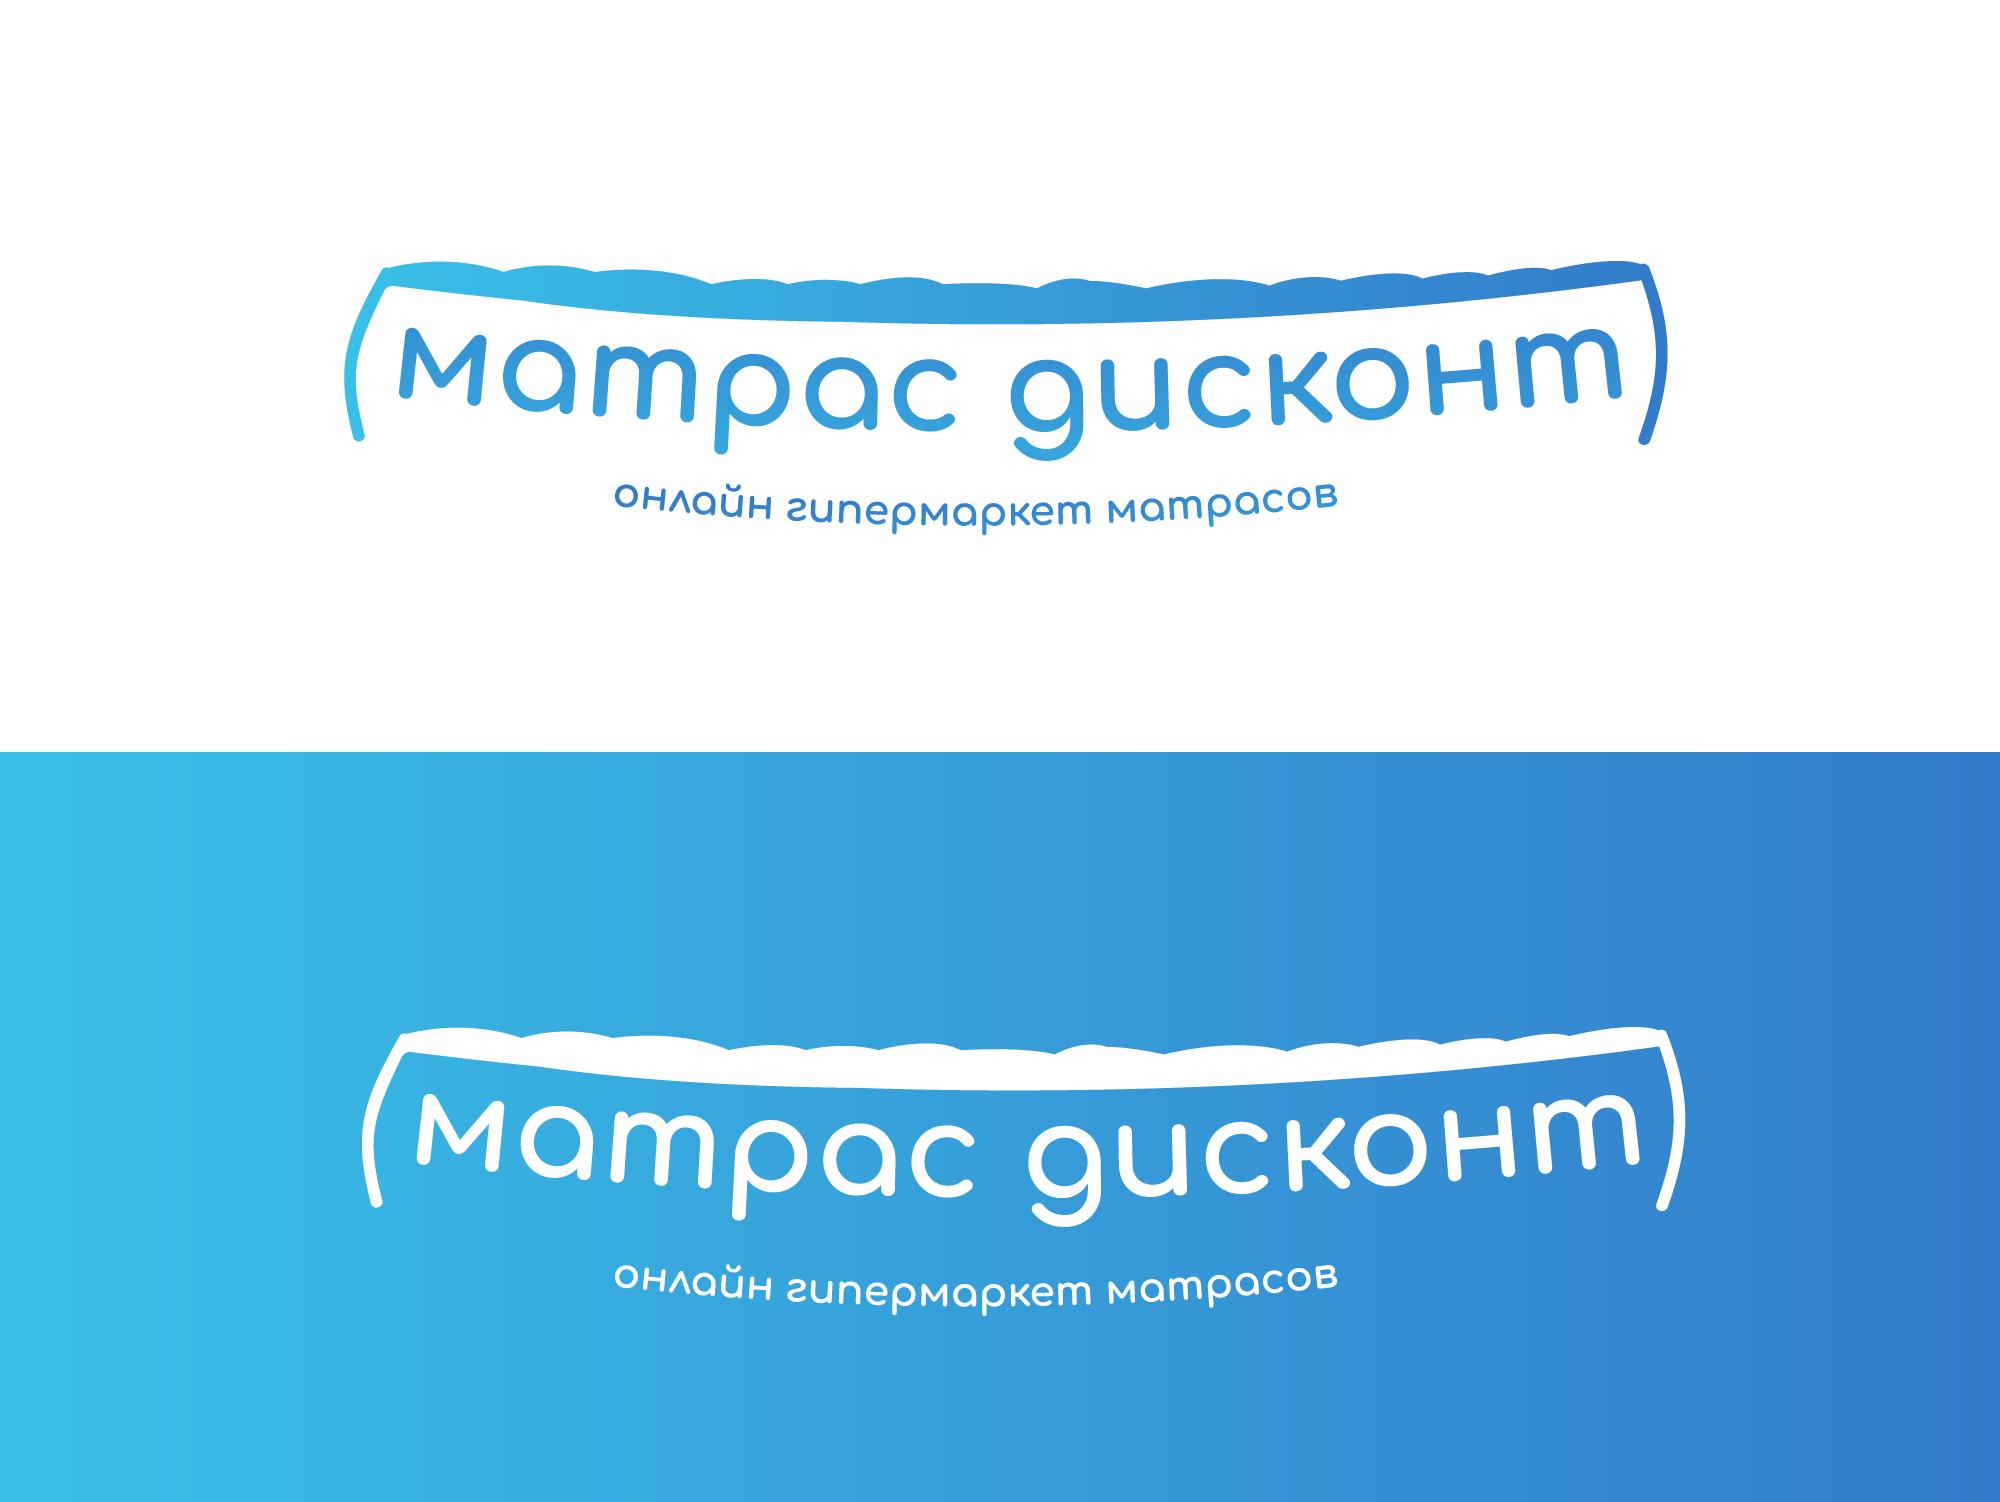 Логотип для ИМ матрасов фото f_3315c8657d1c6abc.png